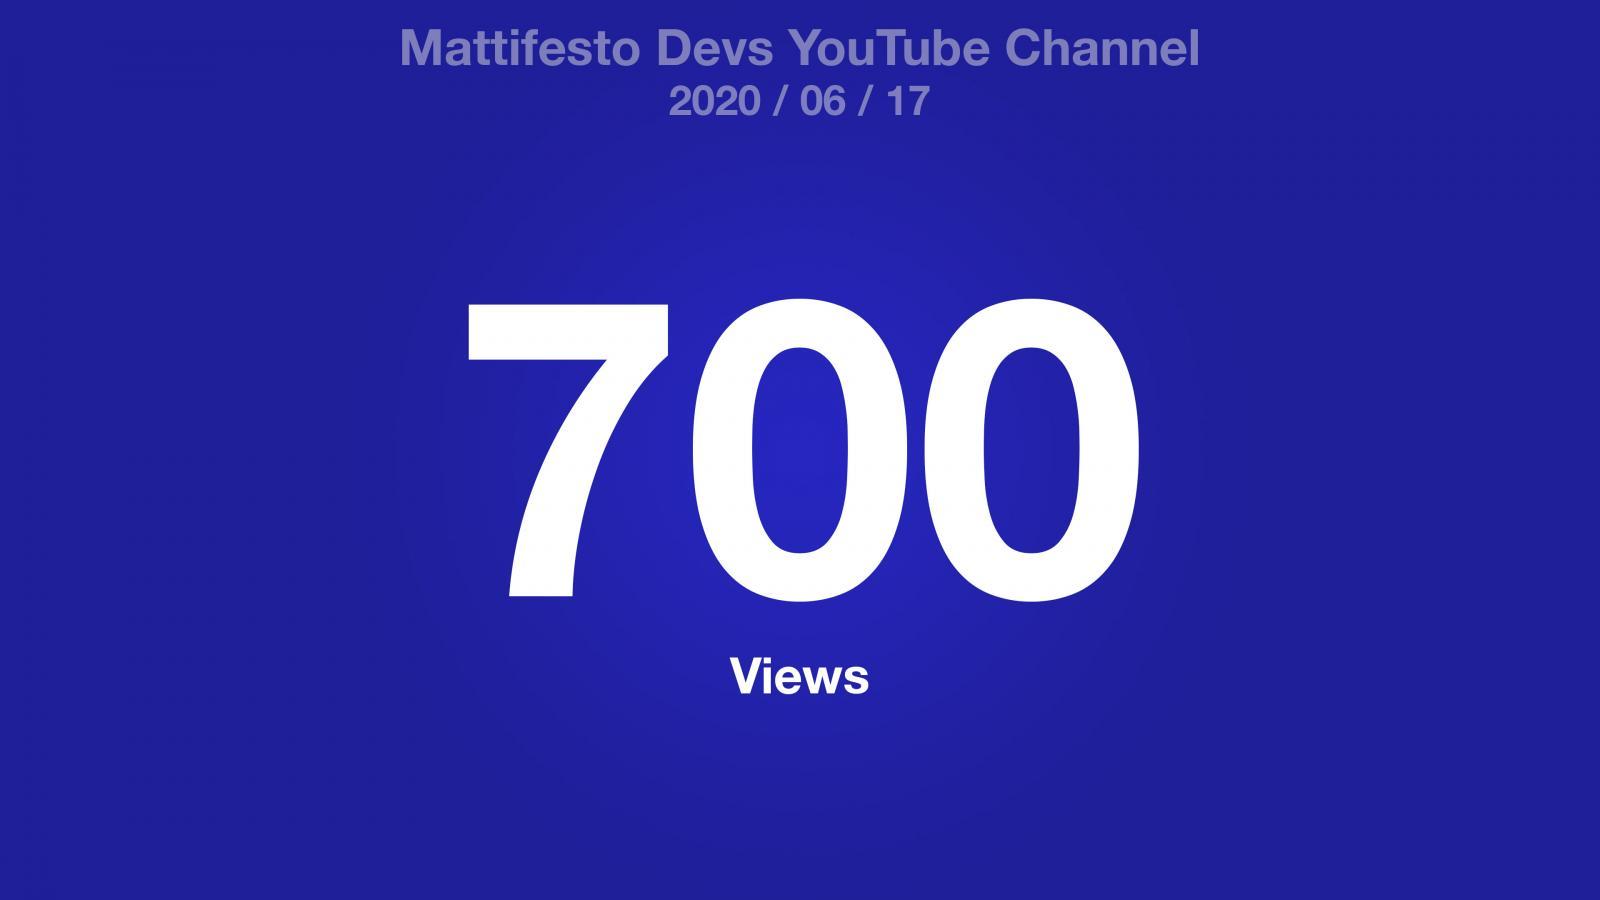 700 Views on Mattifesto Devs YouTube Channel